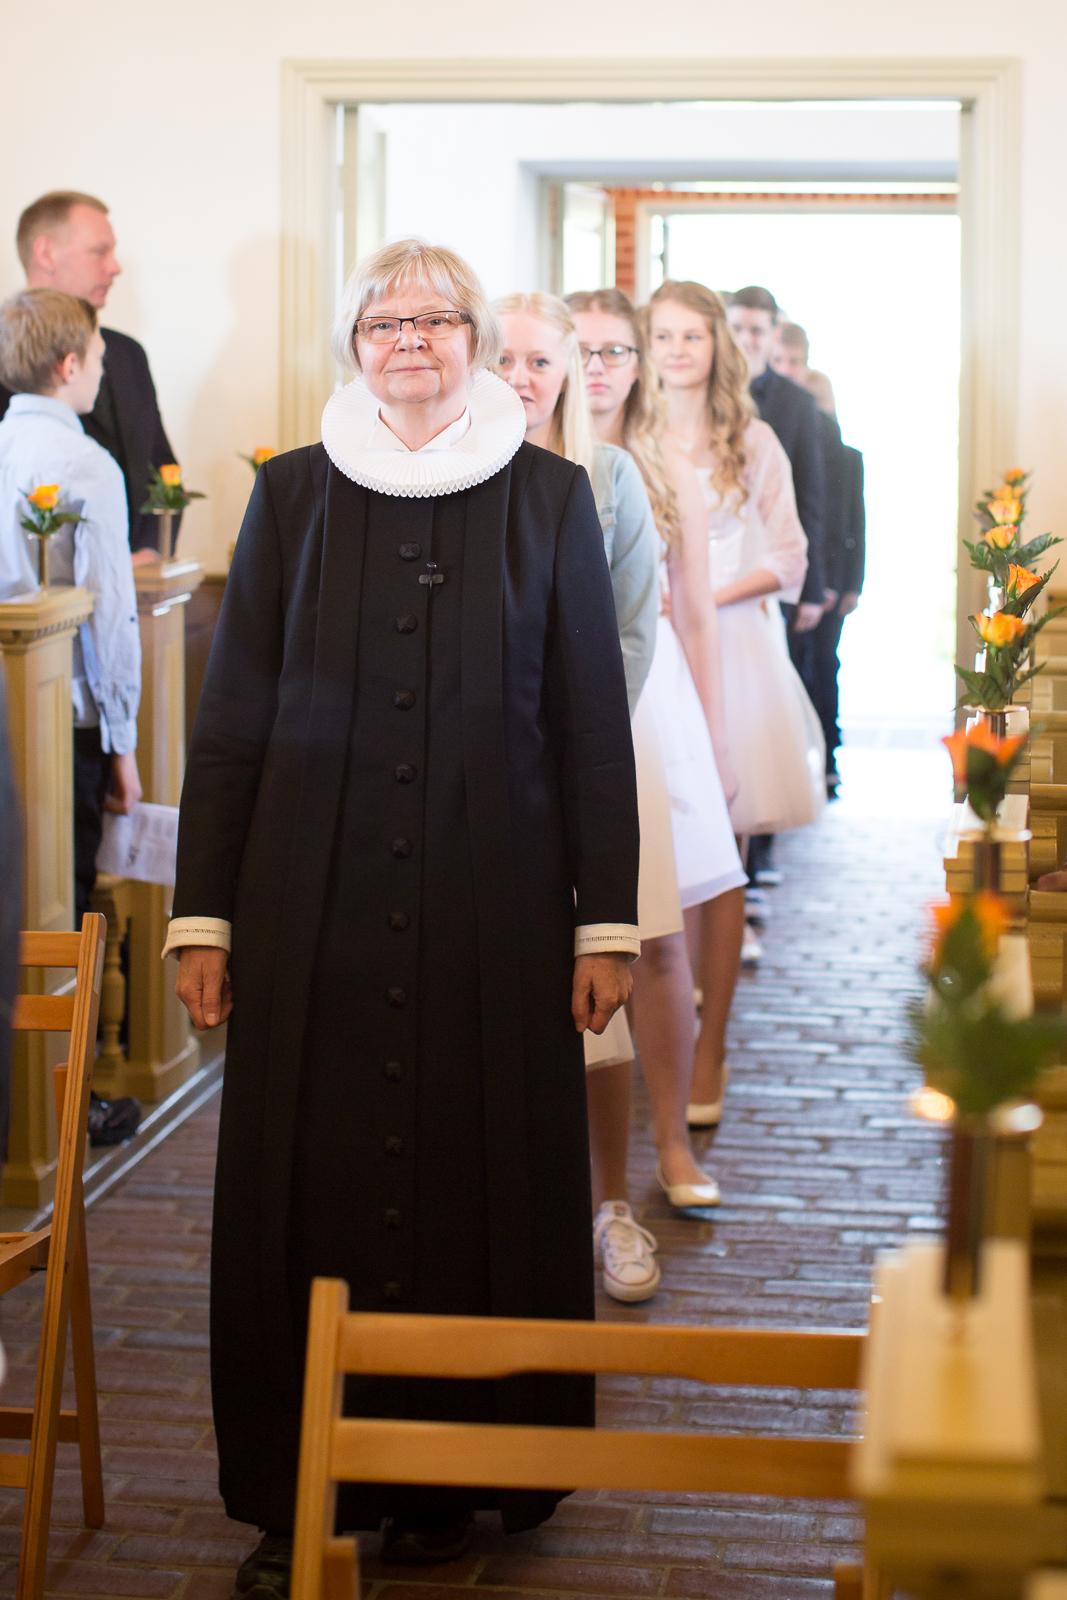 Josefine_konfirmasjon_små-33-of-205.jpg